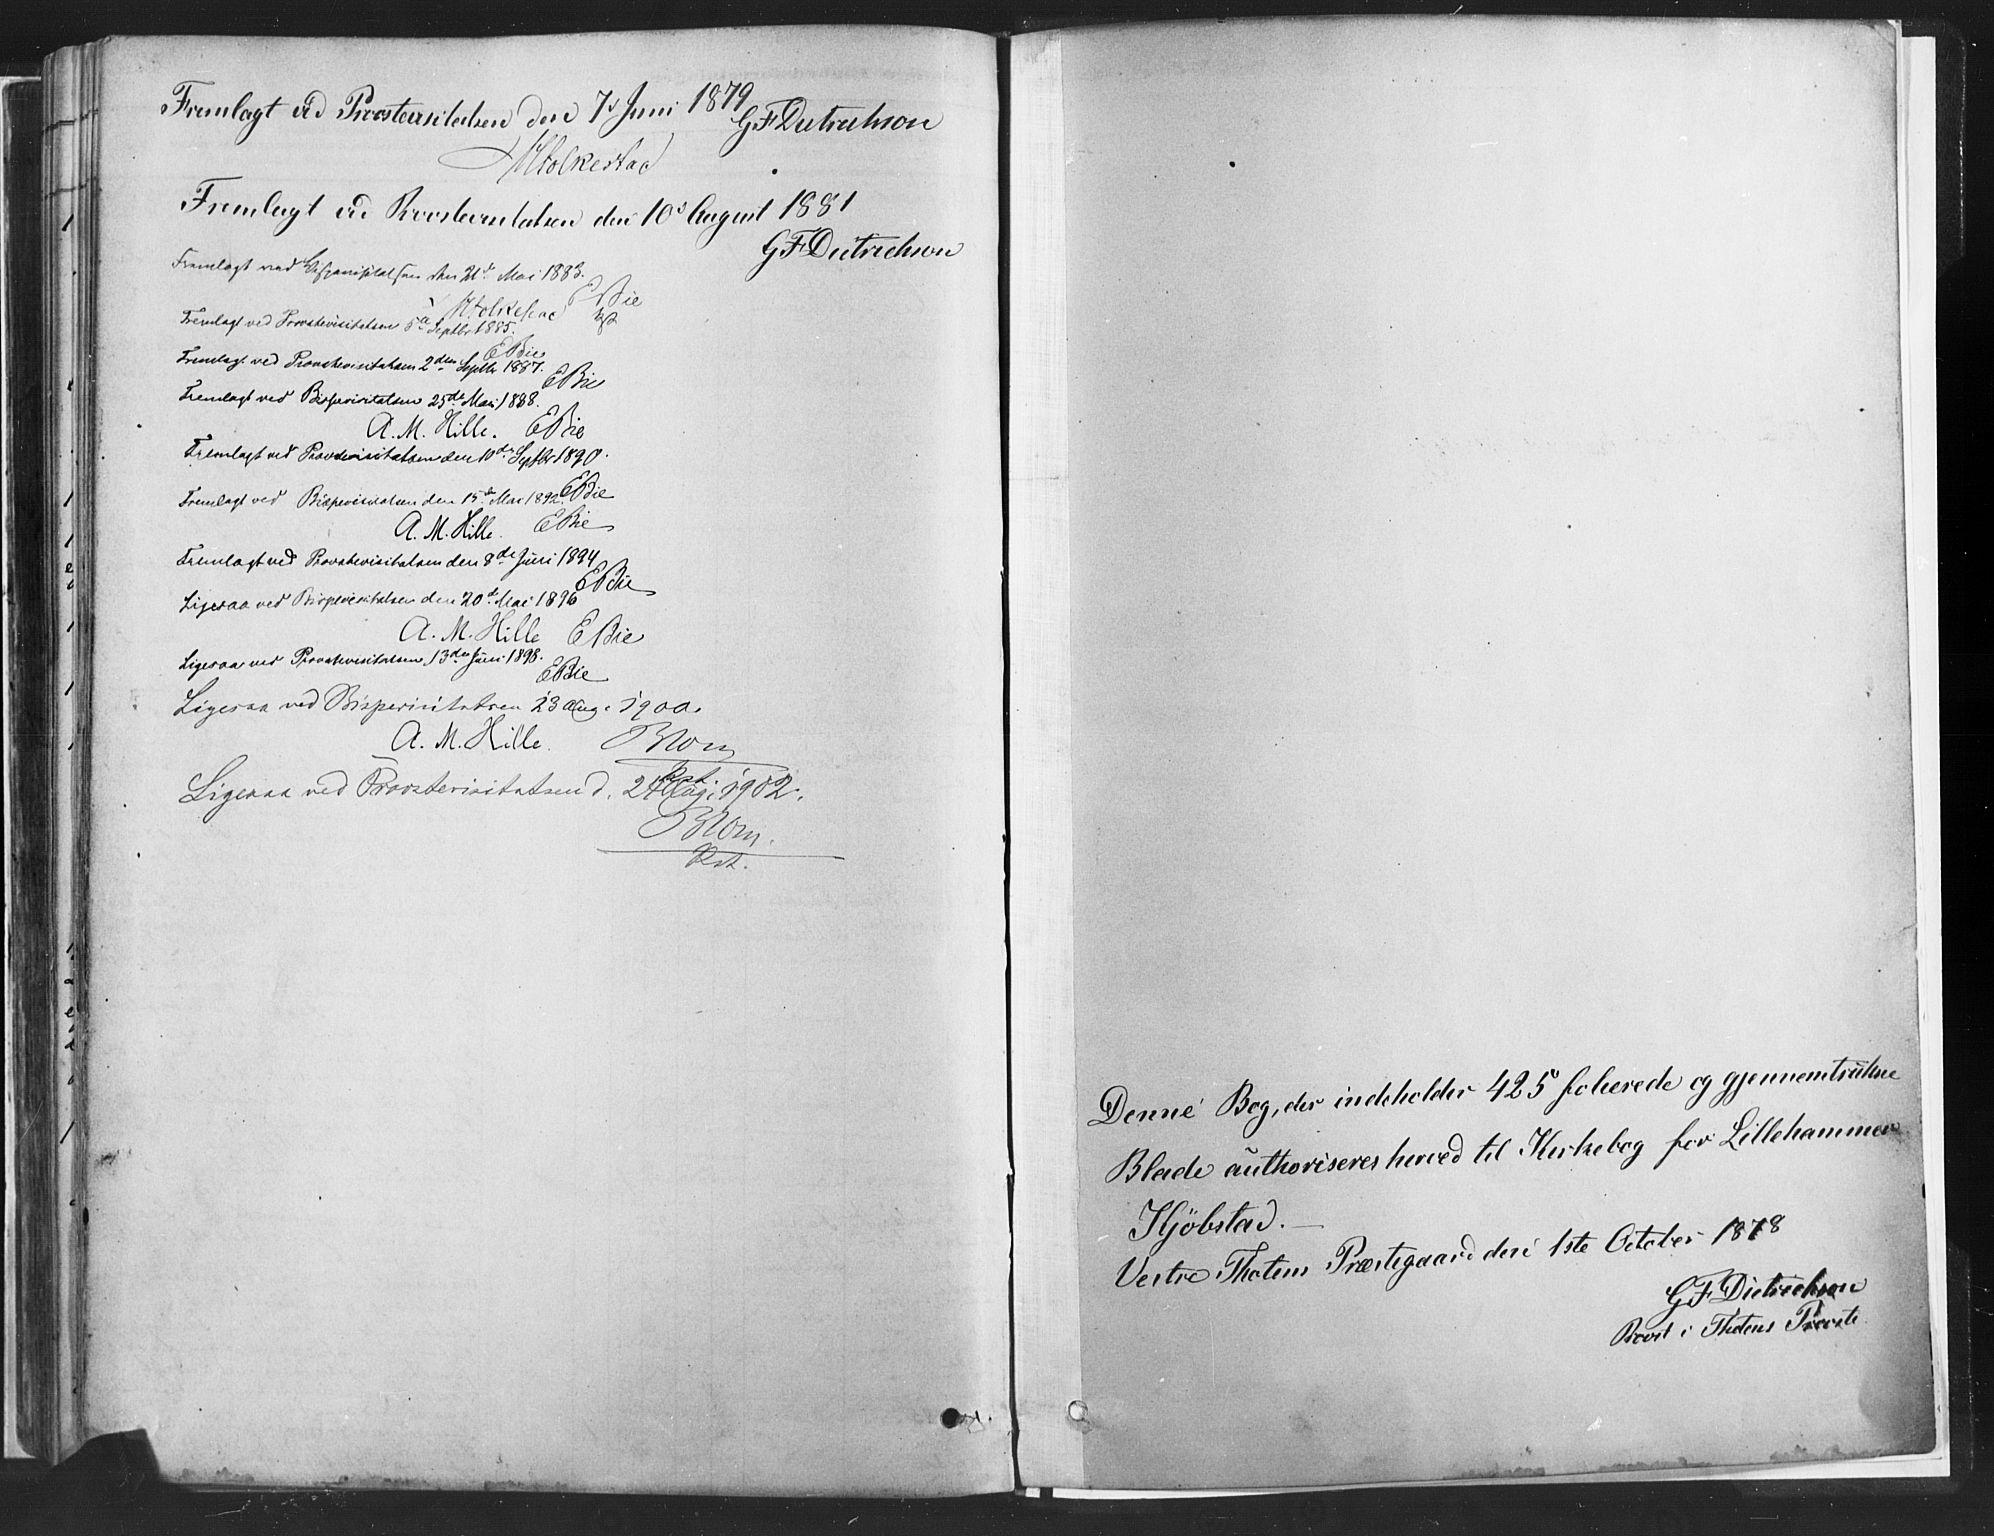 SAH, Fåberg prestekontor, H/Ha/Haa/L0010: Parish register (official) no. 10, 1879-1900